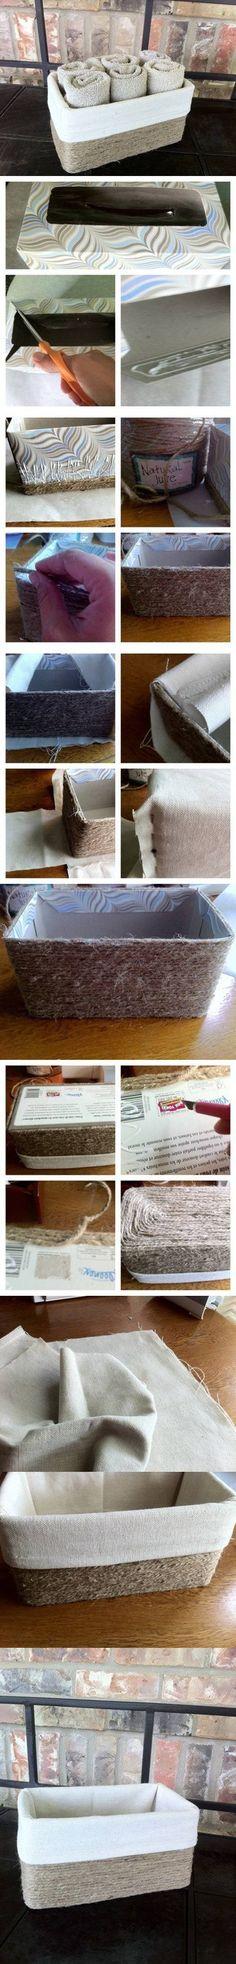 diy, jute basket, cardboard made, instructions